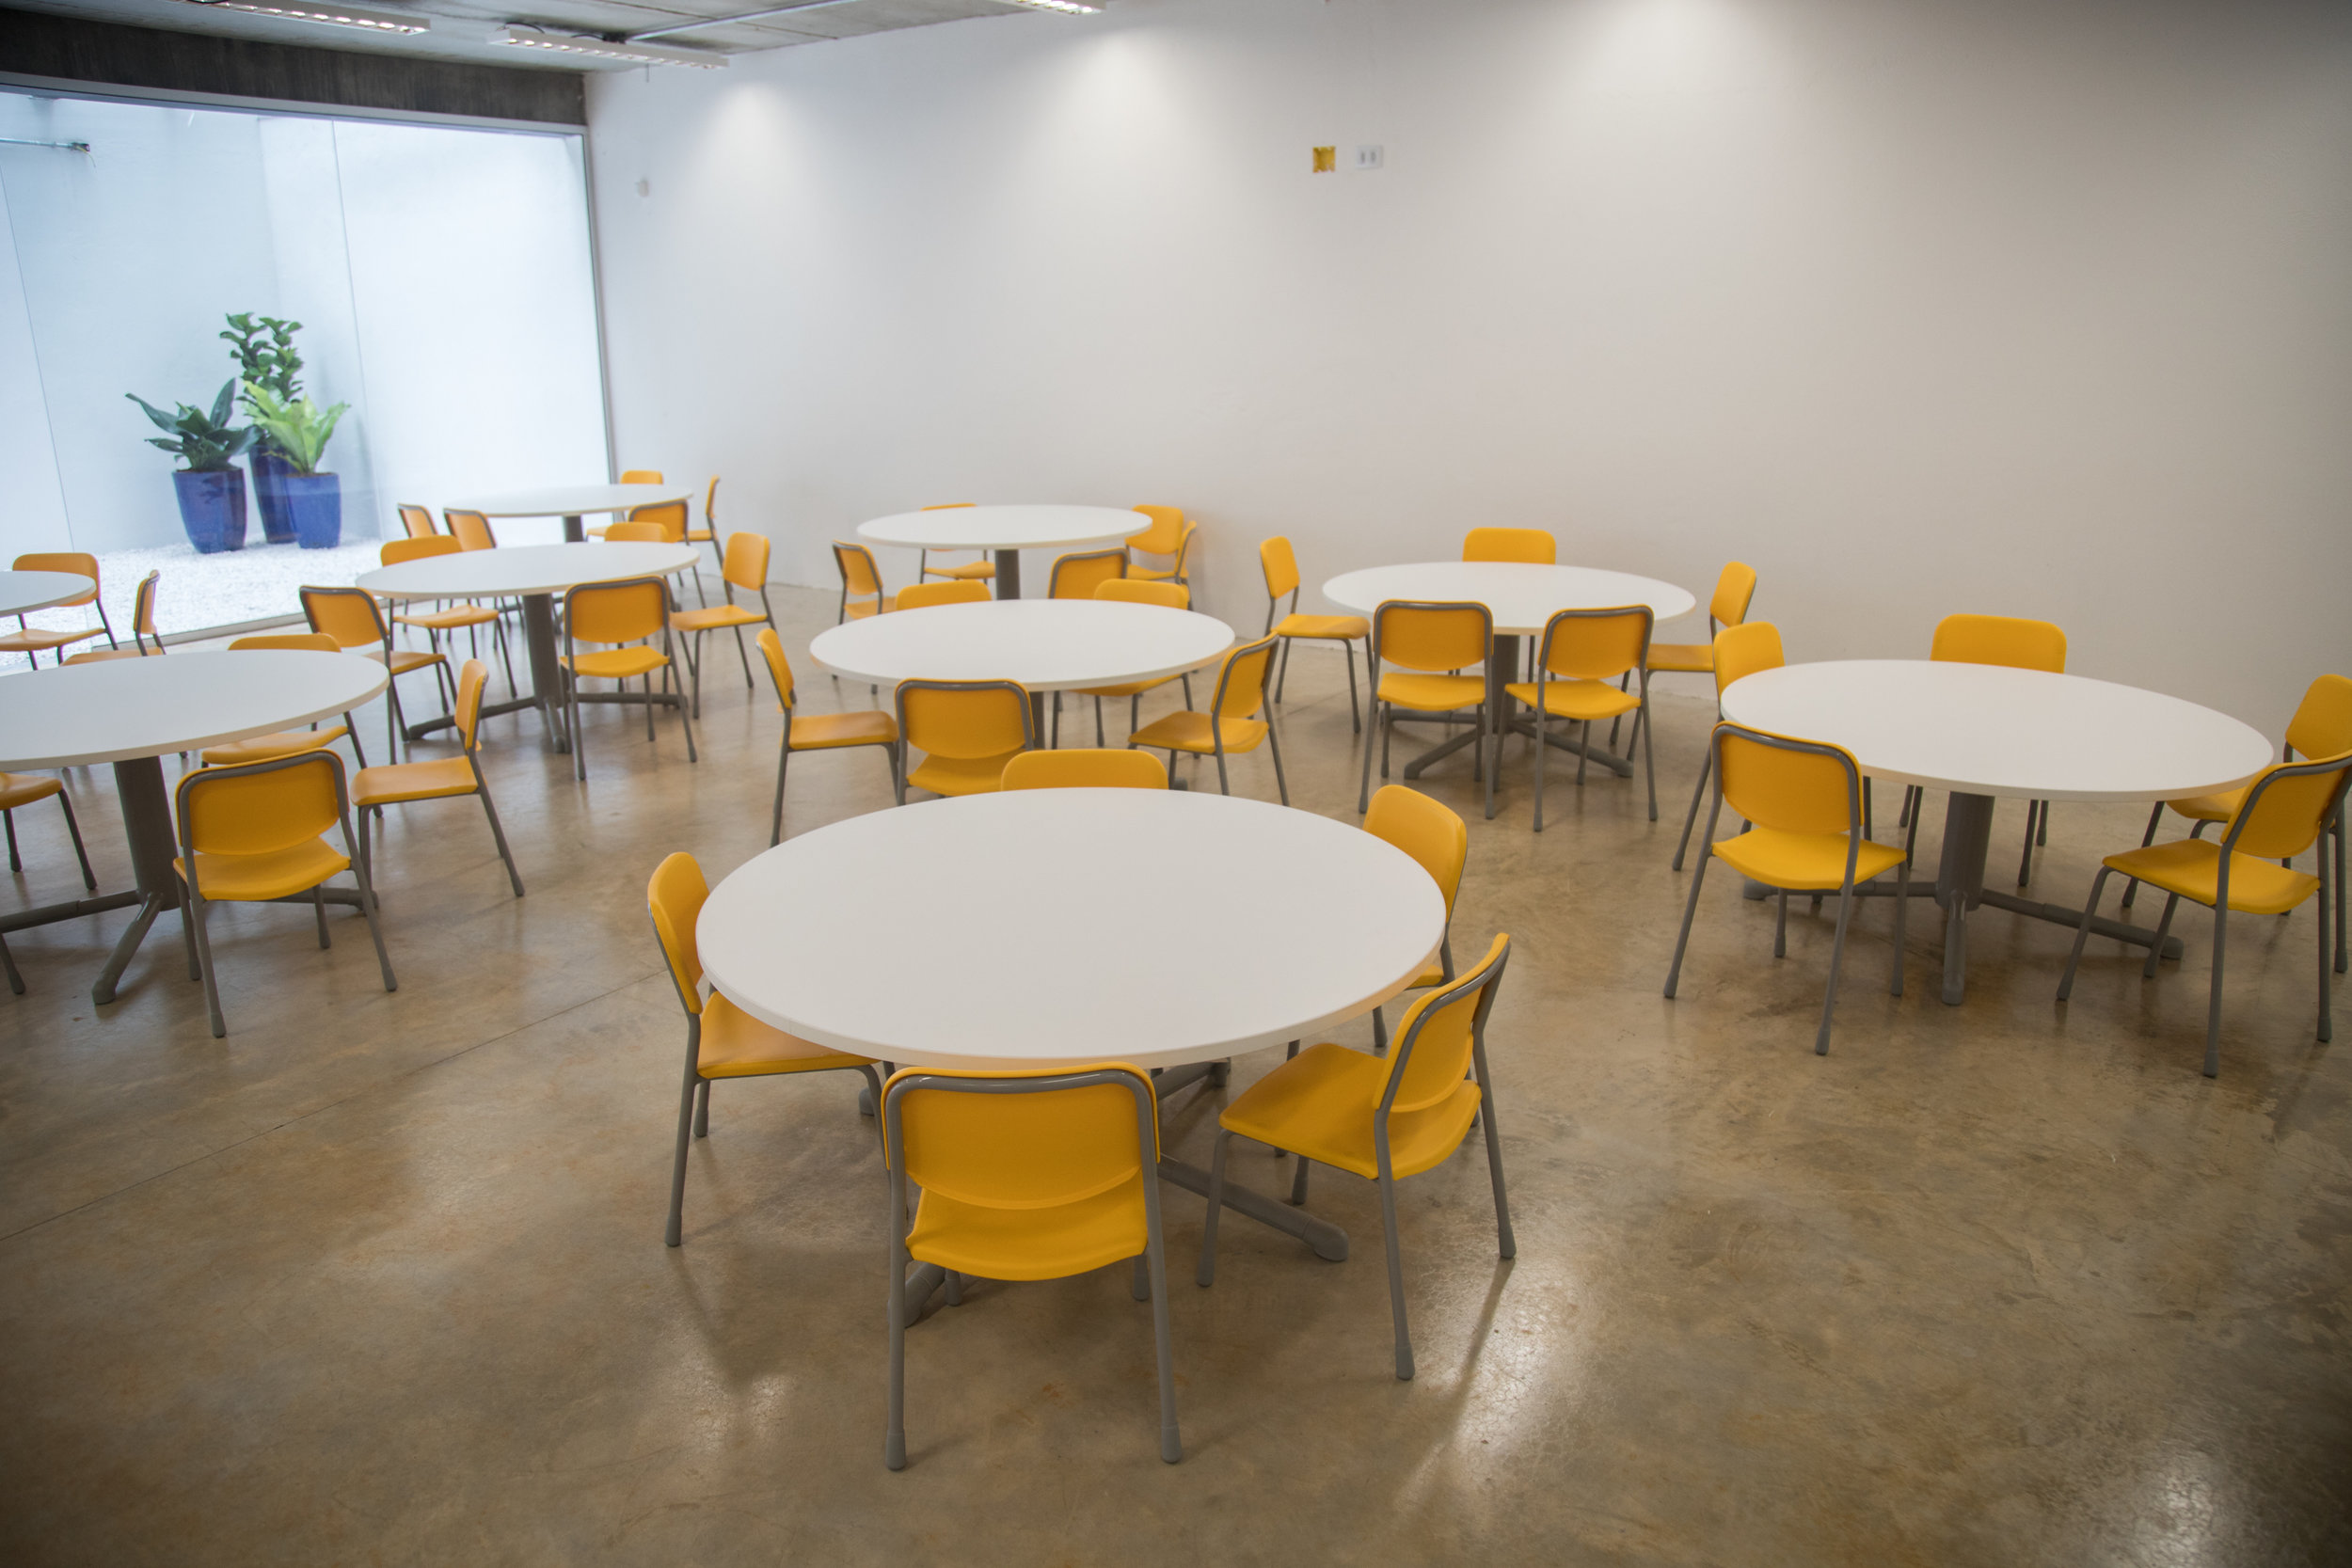 FOTOS - THE INTERNATIONAL SCHOOL OF SÃO PAULO 48.jpg